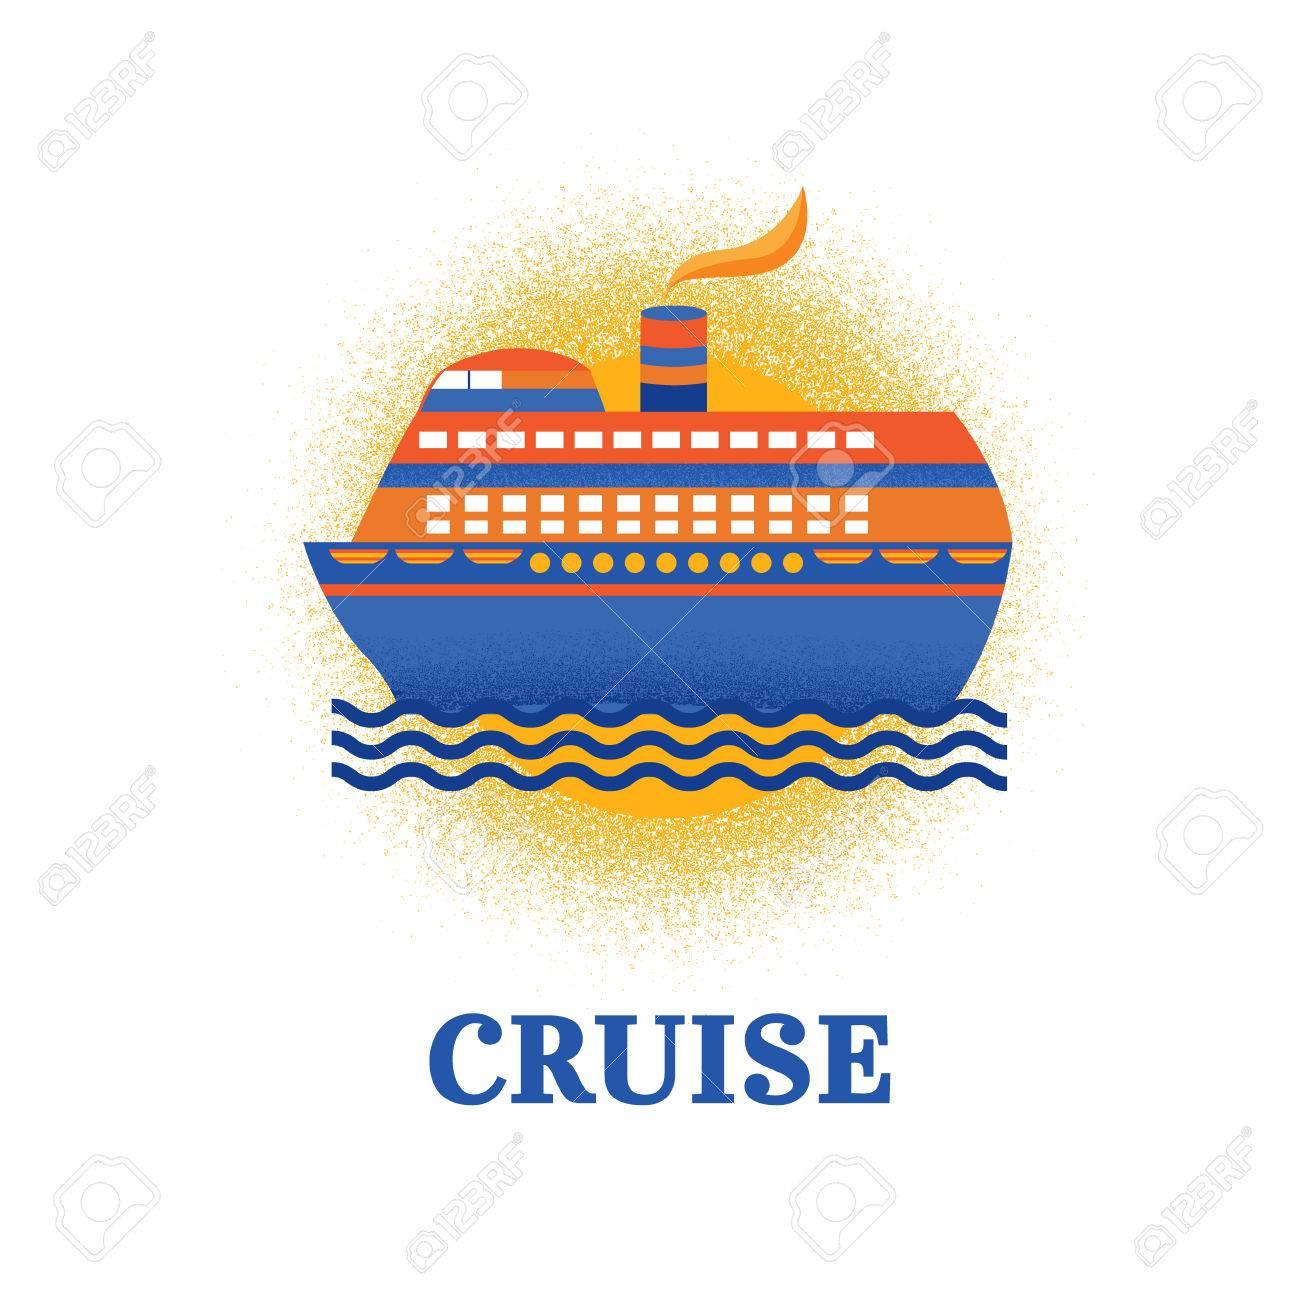 Illustration Vector Cruise Ship Illustration On Vacation Vacation